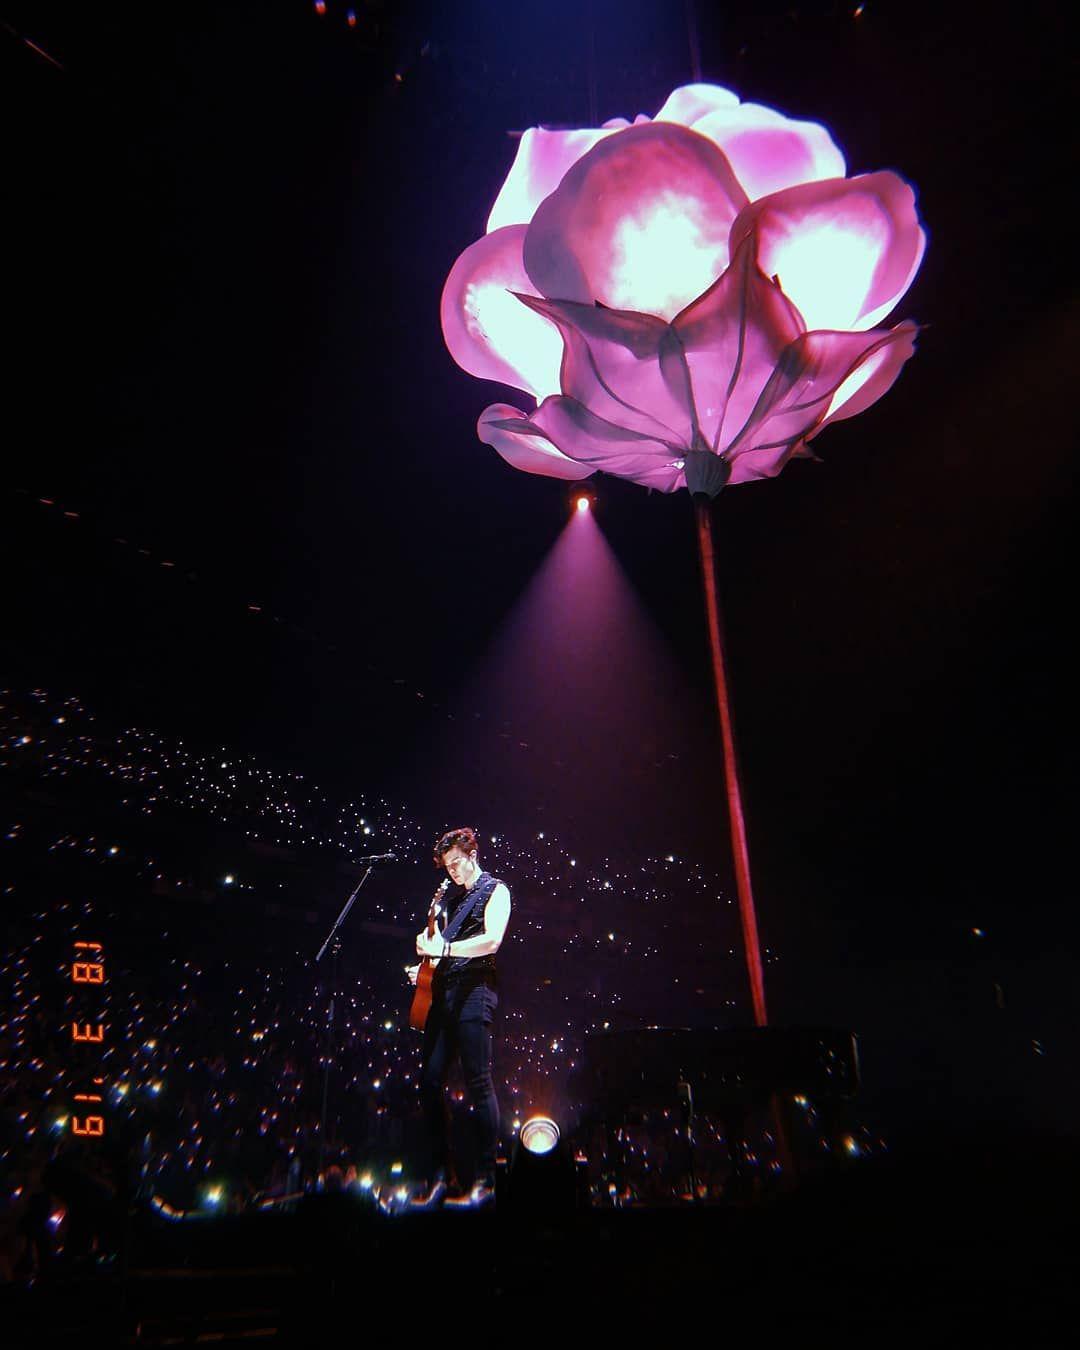 Shawn Mendes The Tour Cologne Koln Johanna Loves Shawn Mendes Tour Shawn Mendes Wallpaper Shawn Mendes Concert